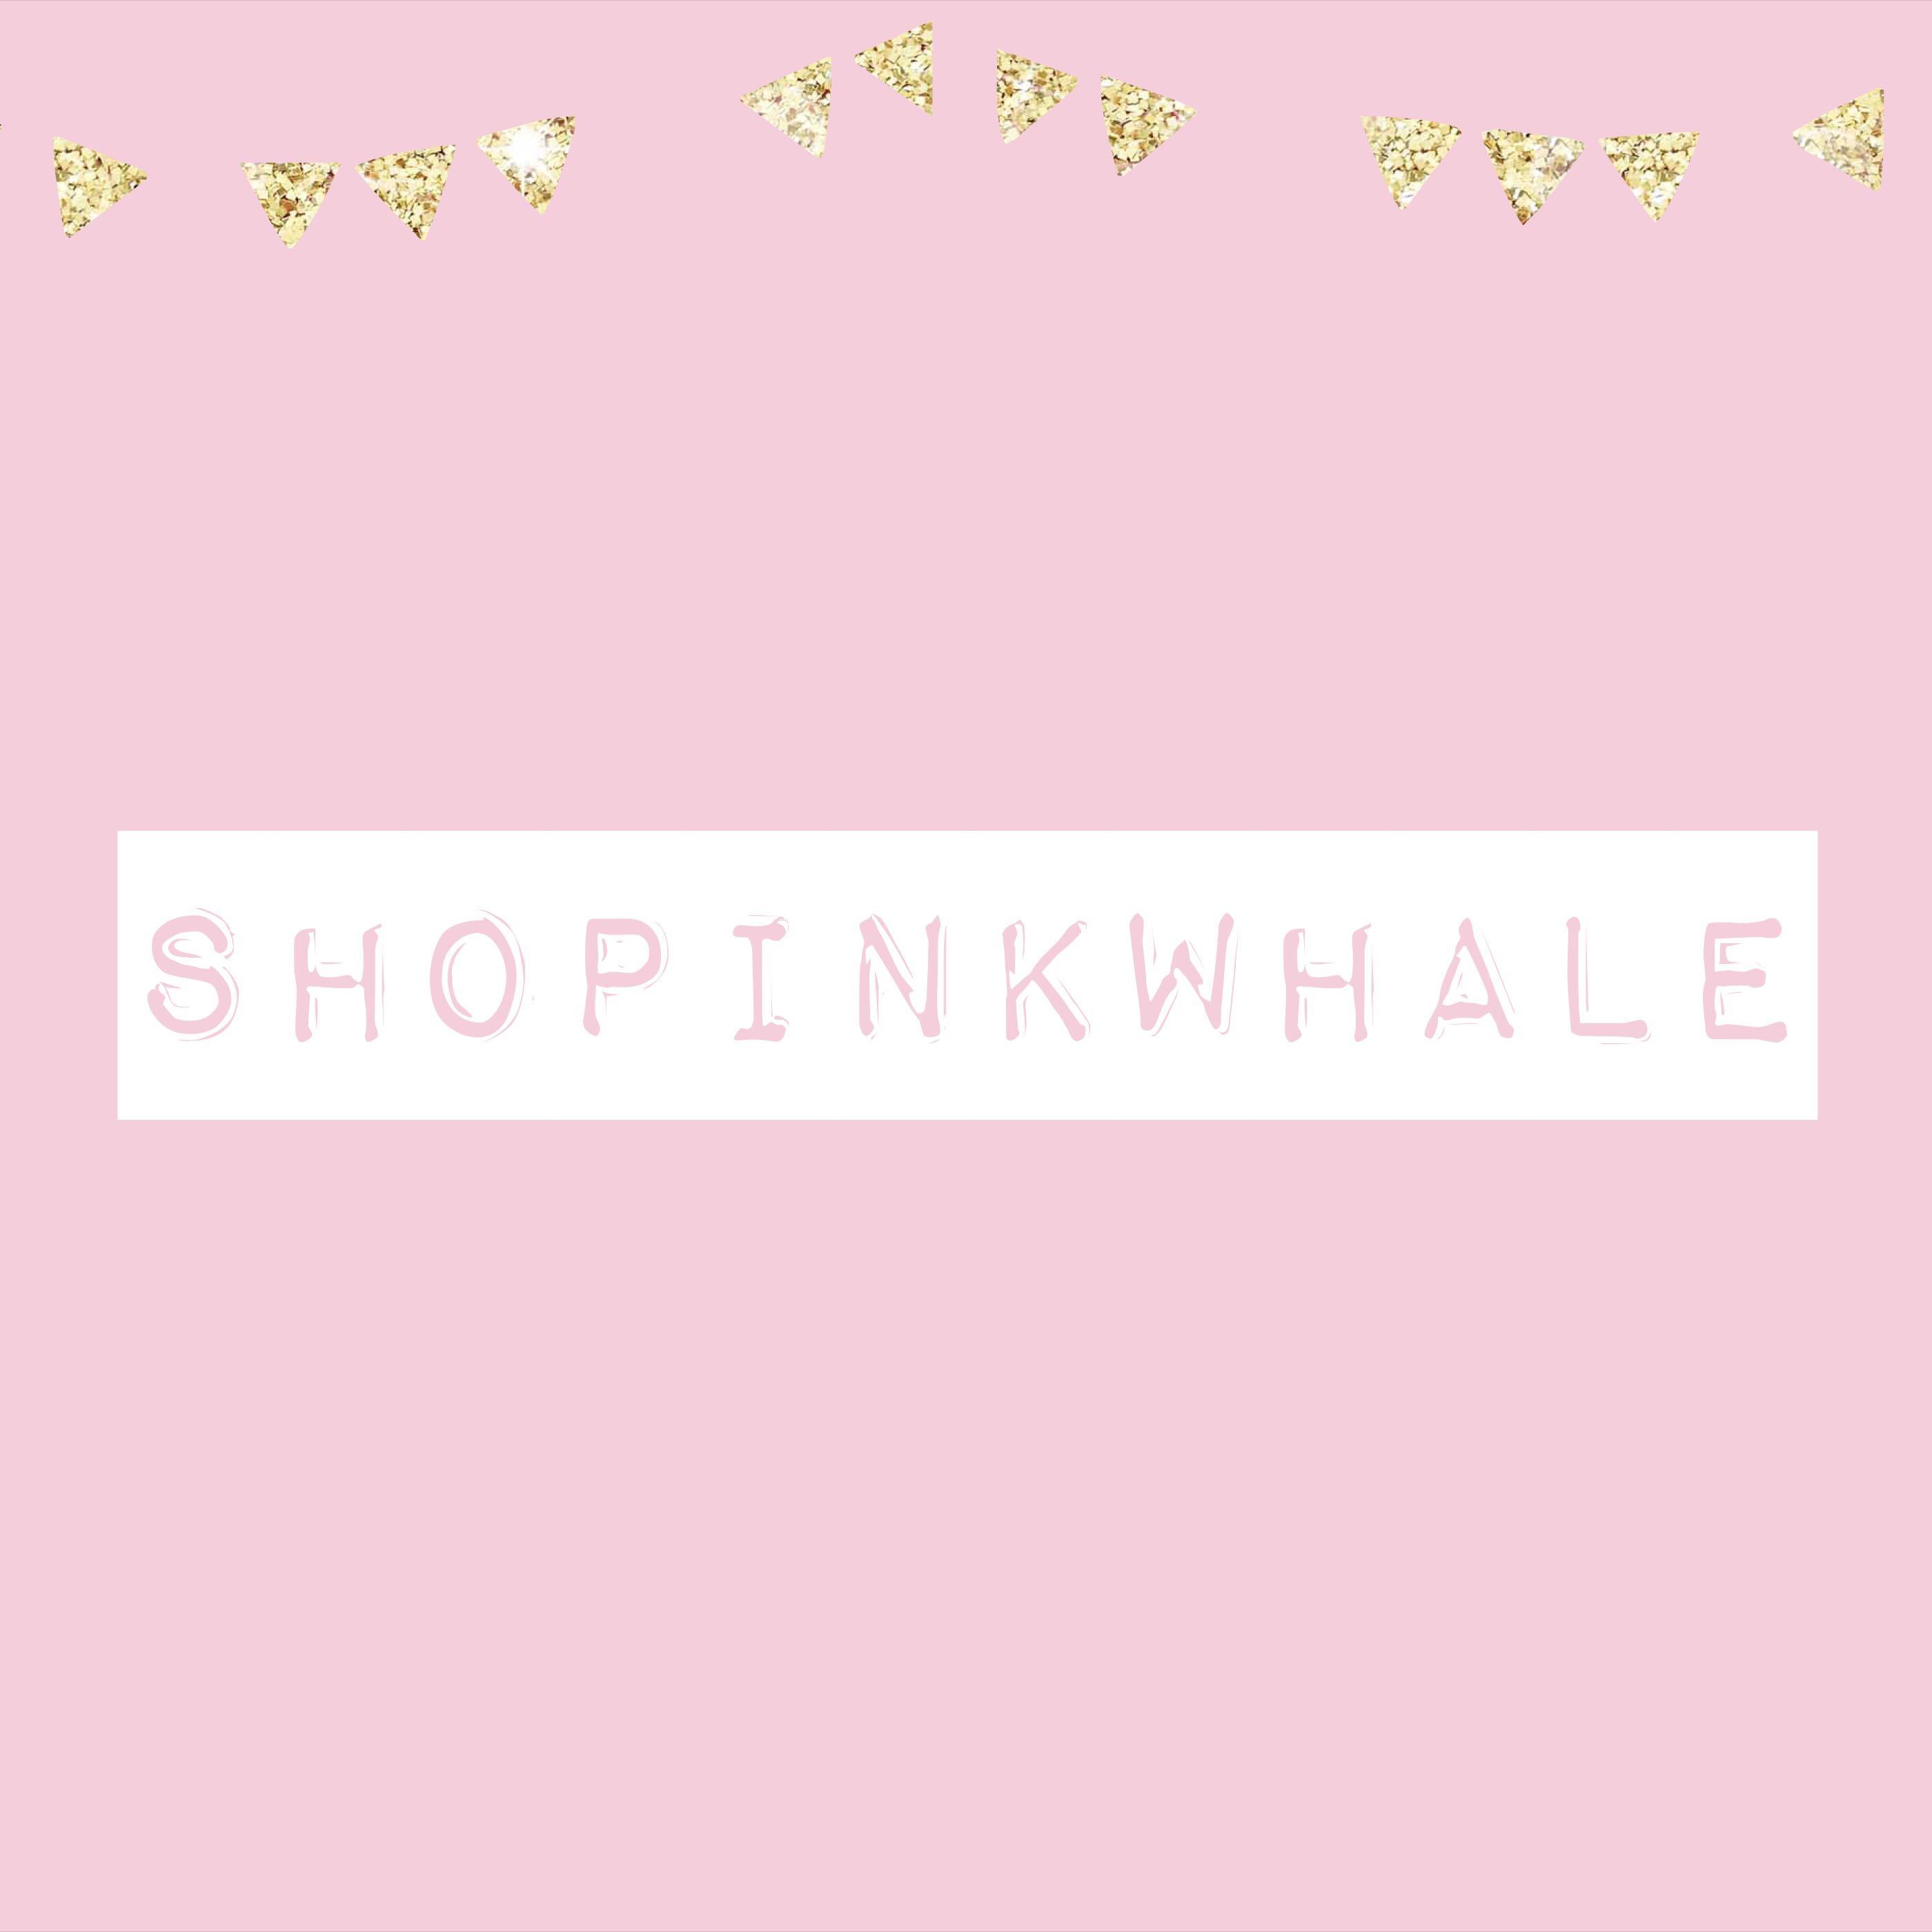 shopinkwhale